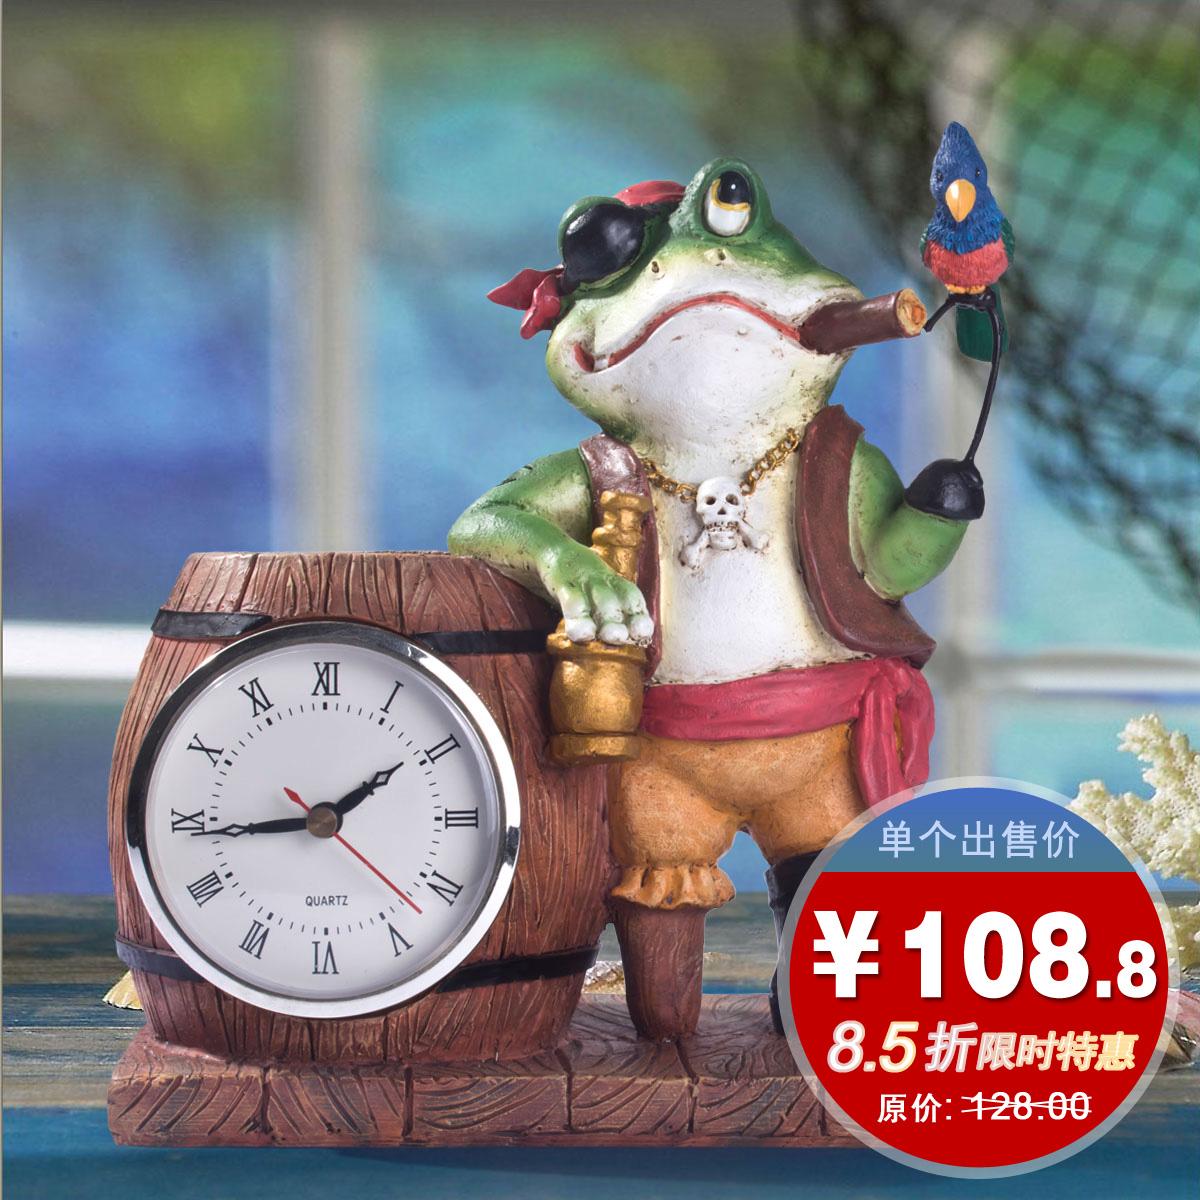 Настенные часы Wisdom clever poly hx010271 8.5